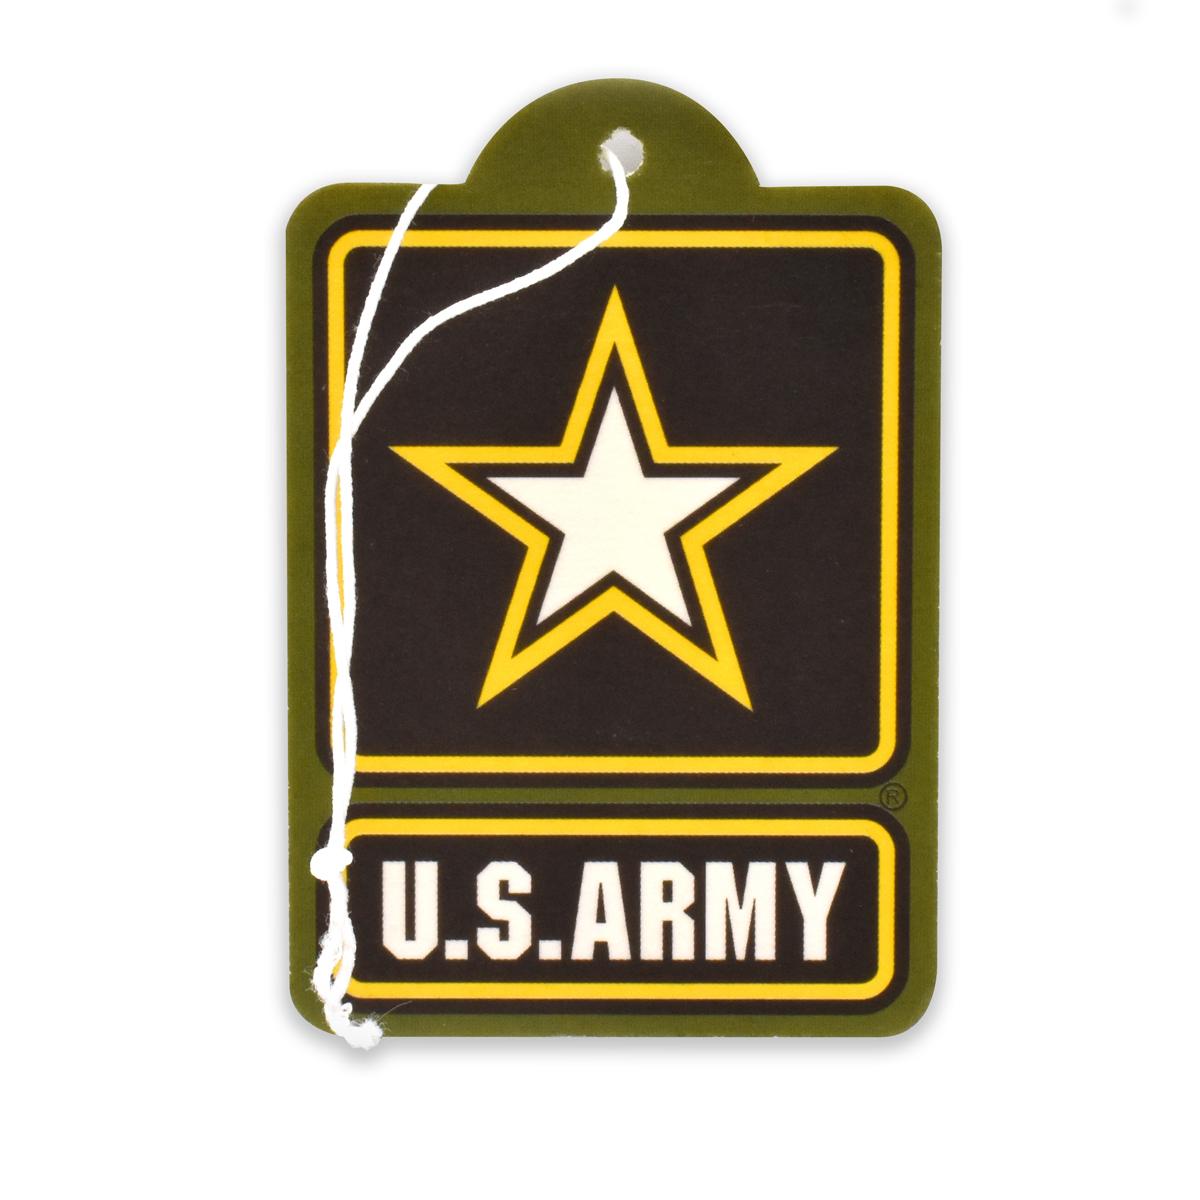 Army Star Air Freshener - Army Star Air Freshener